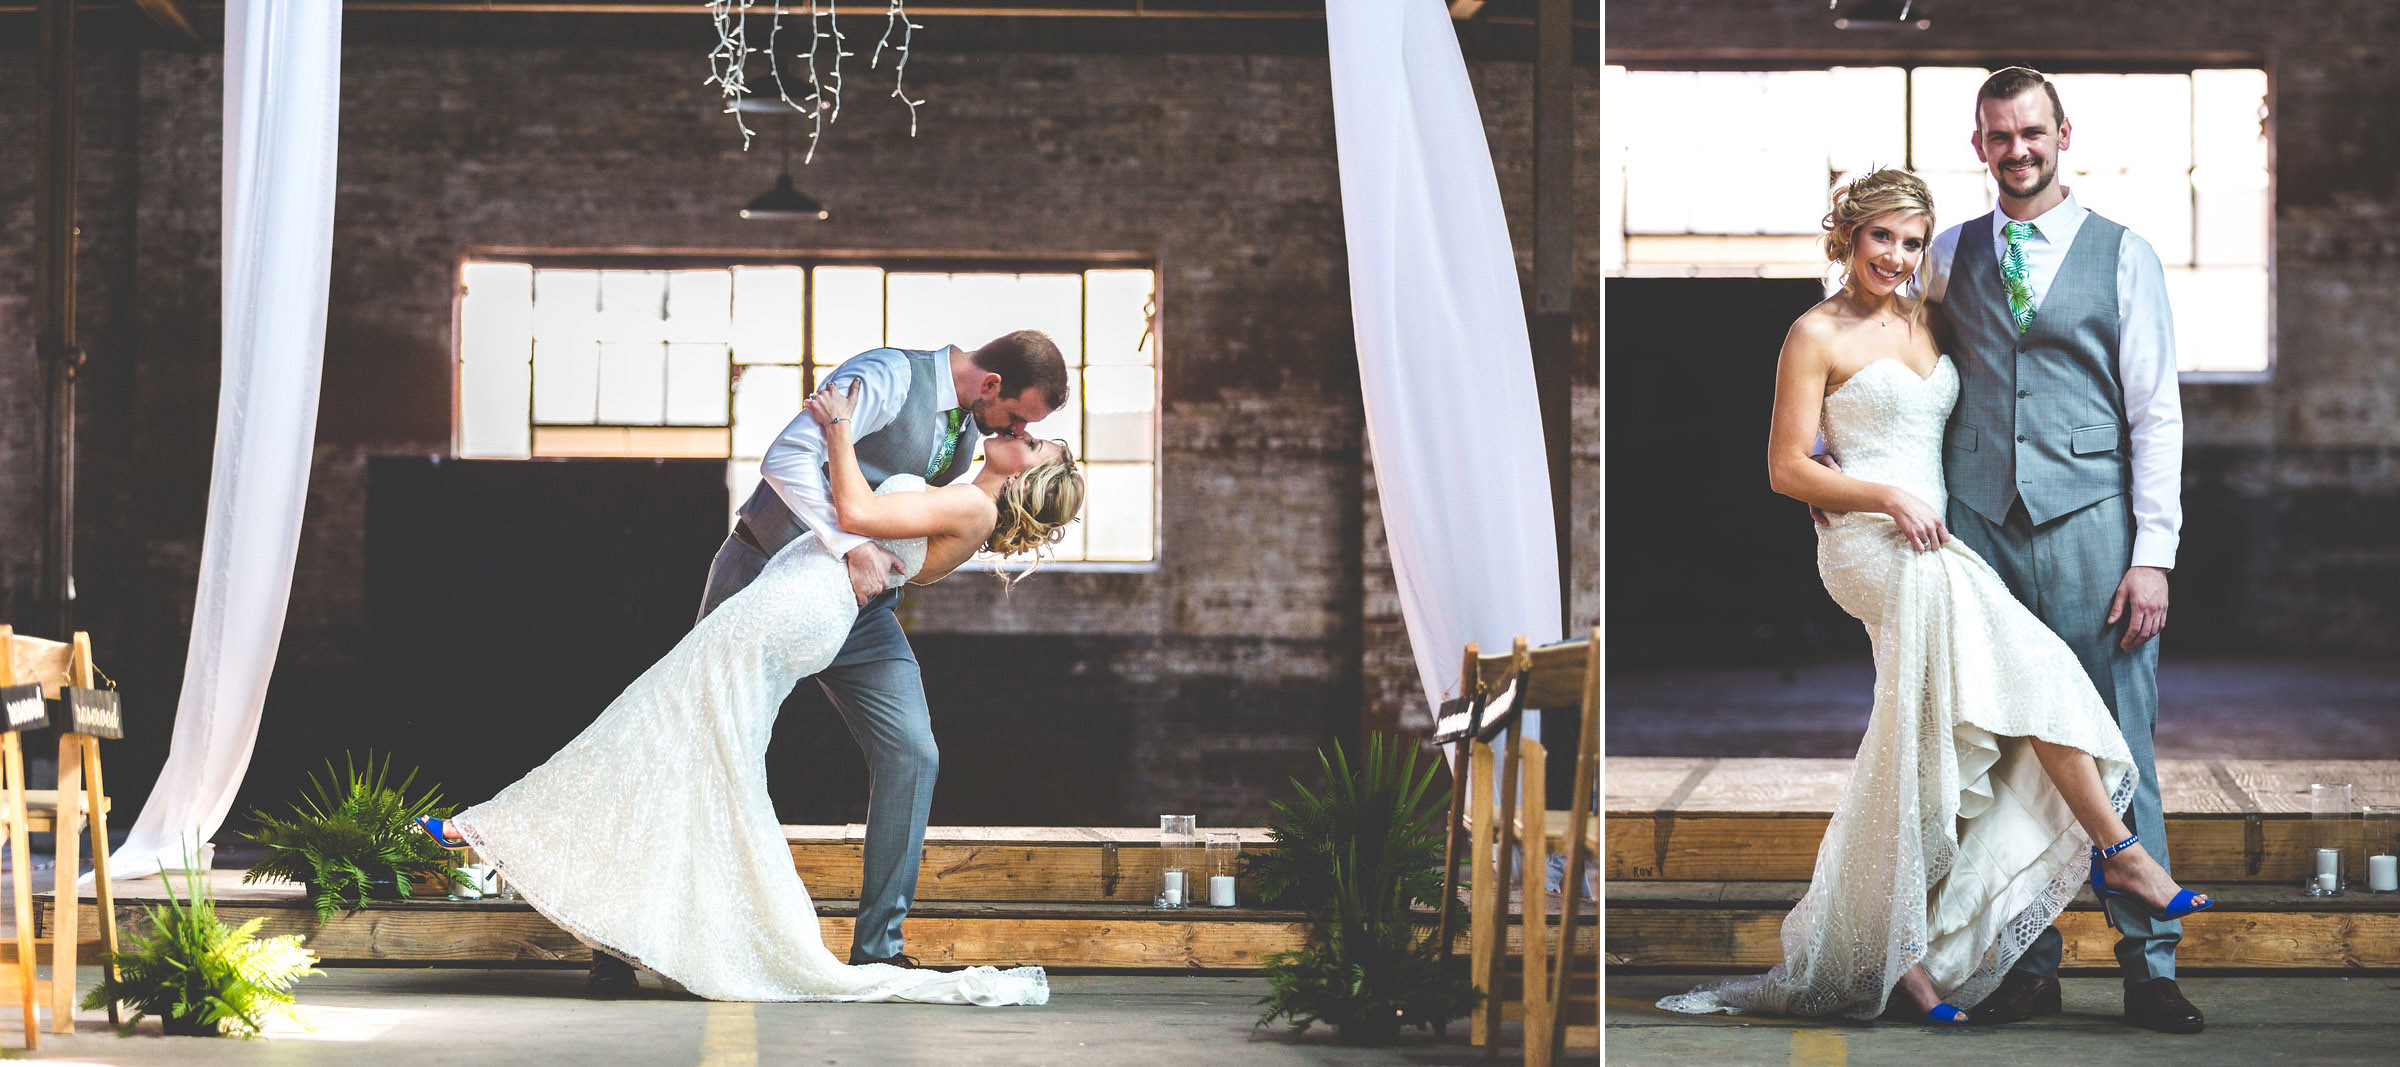 The-Glass-Factory-Wedding-Photographer-Adam-Szarmack-31.jpg